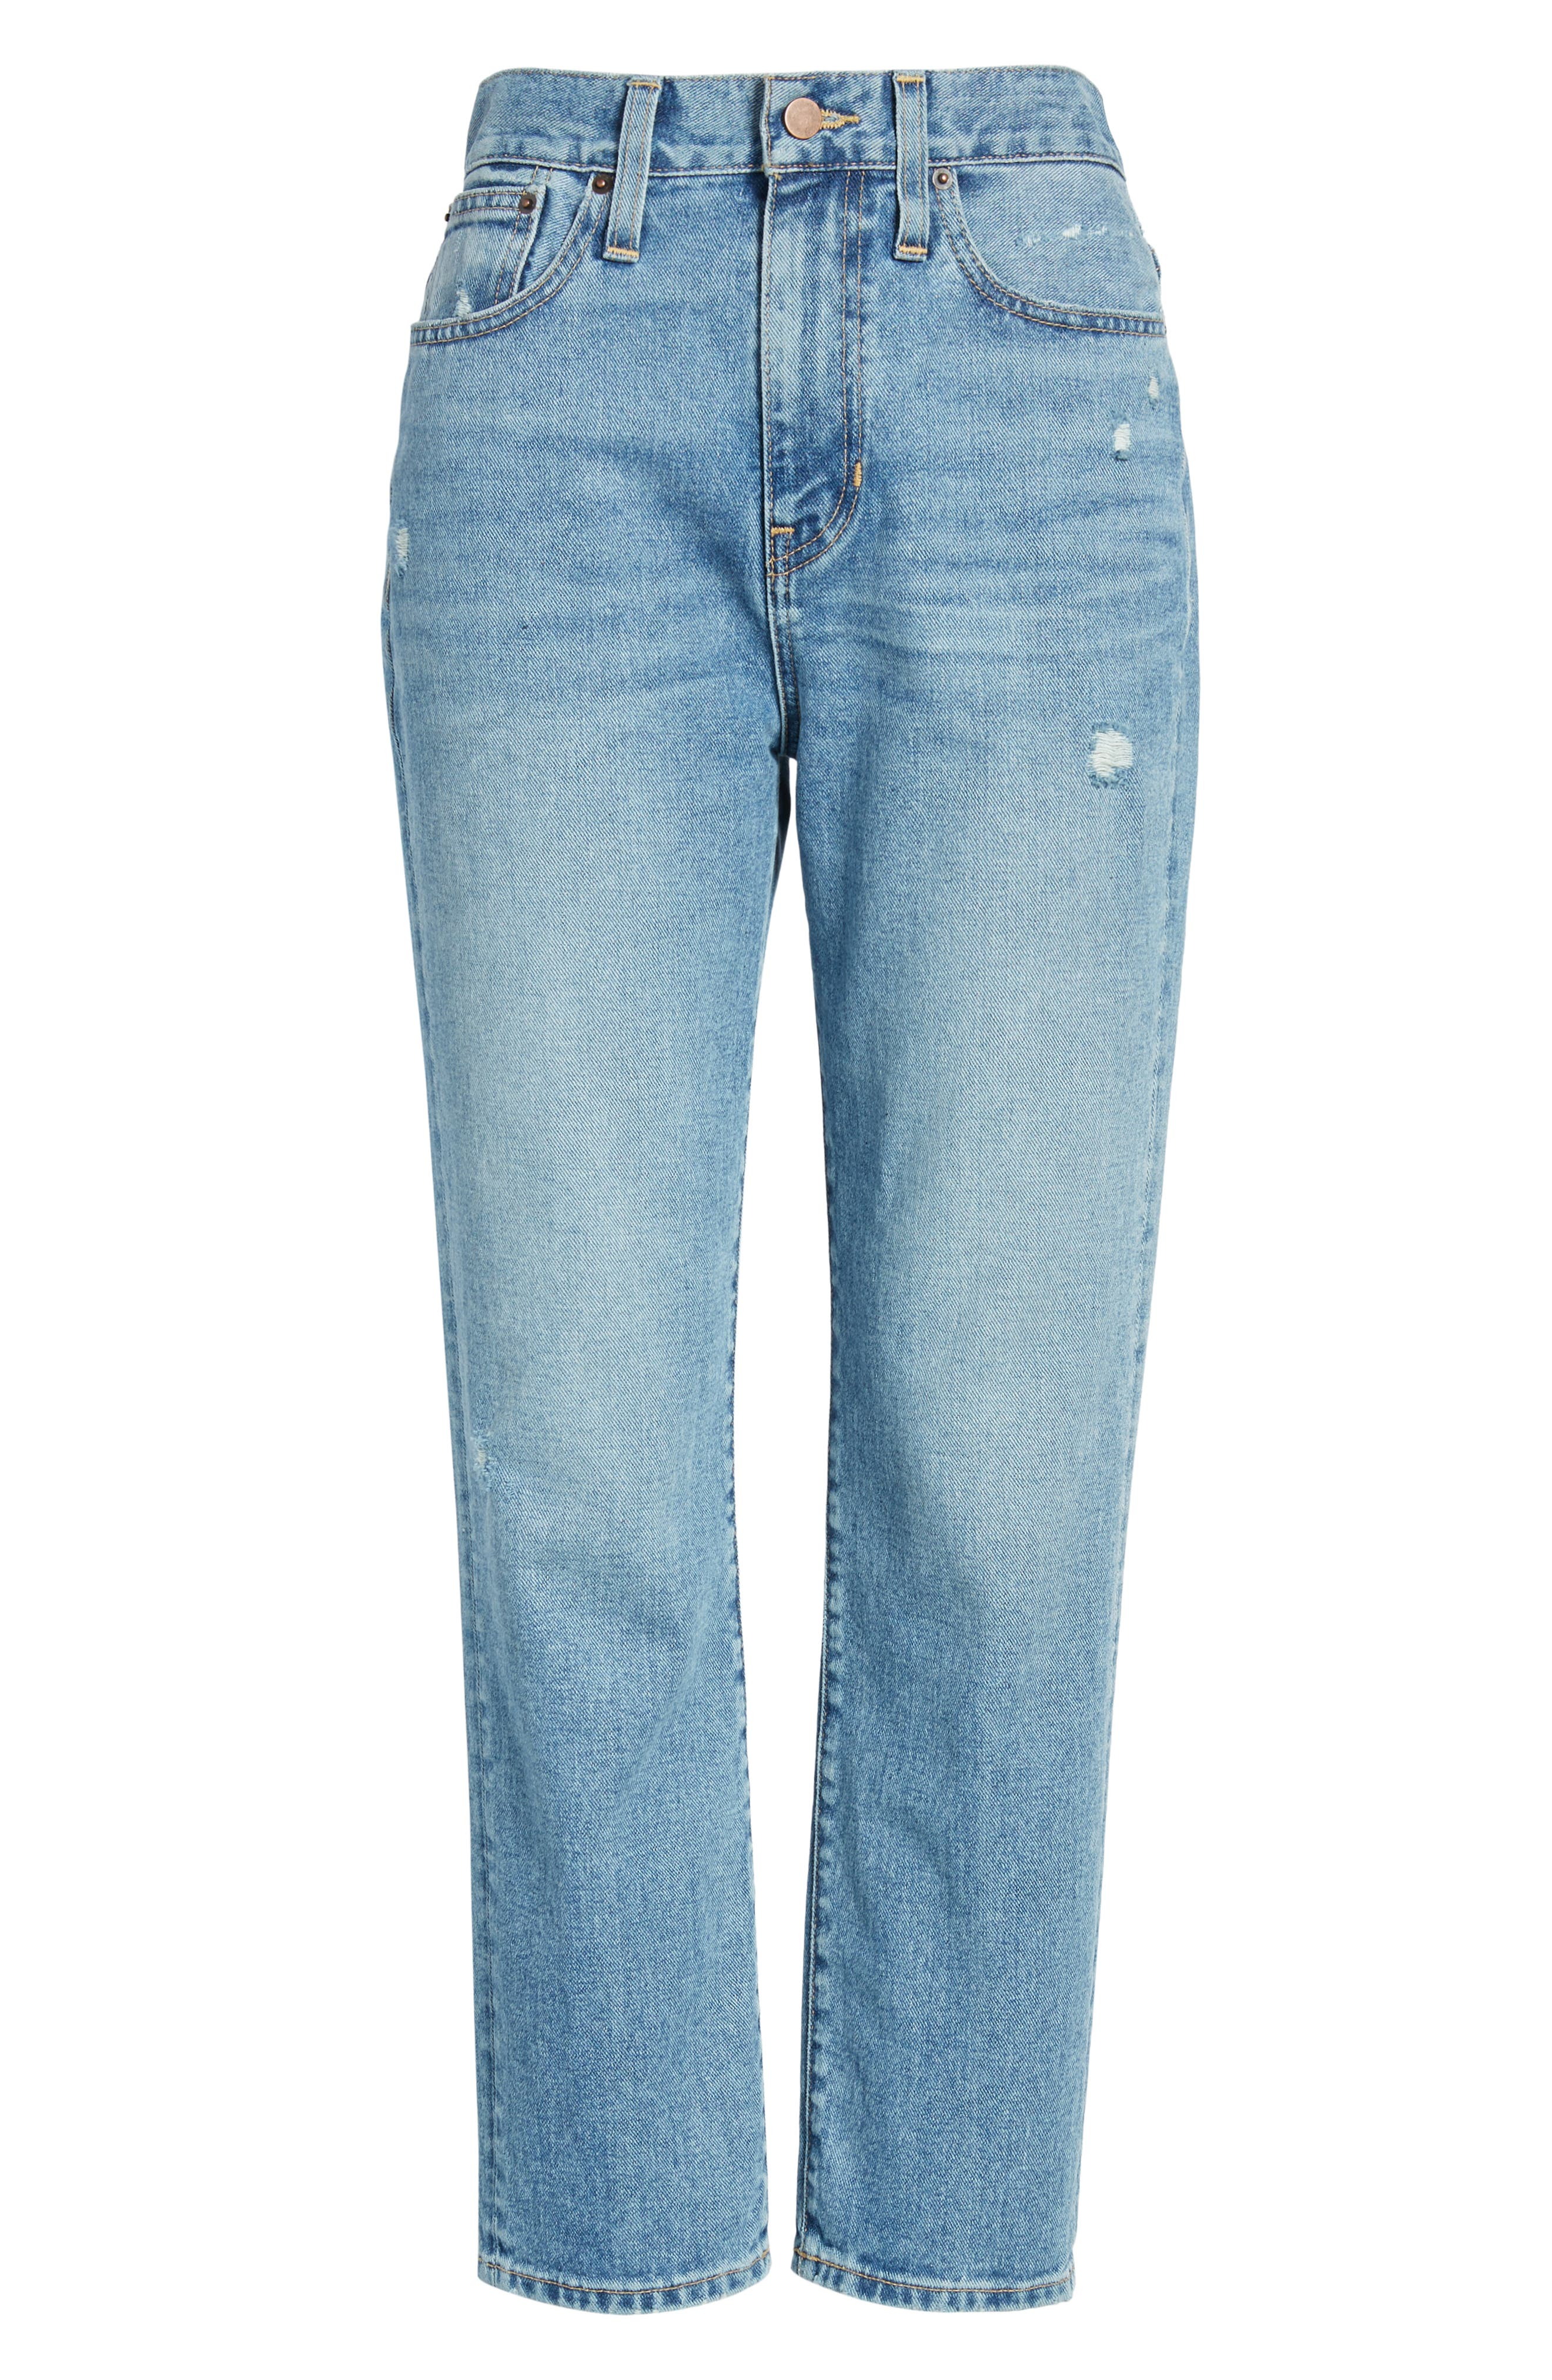 Cigarette Jeans,                             Alternate thumbnail 7, color,                             LIGHT INDIGO WASH